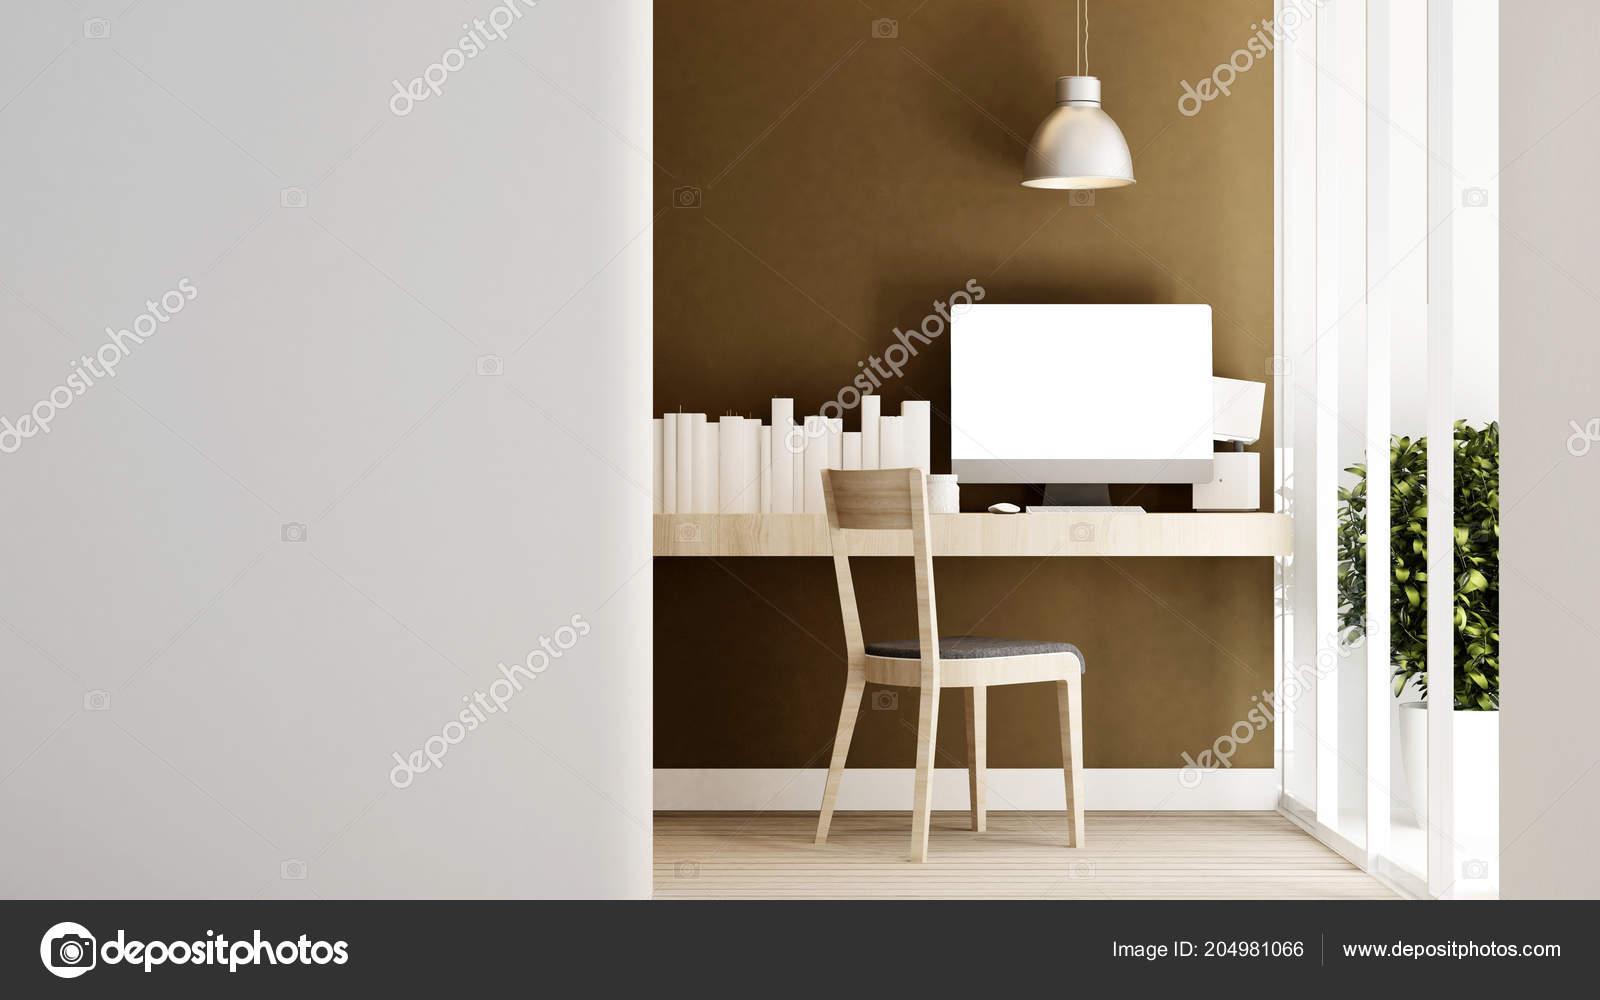 Werkplek brown wand huis appartement interieur design voor artwork